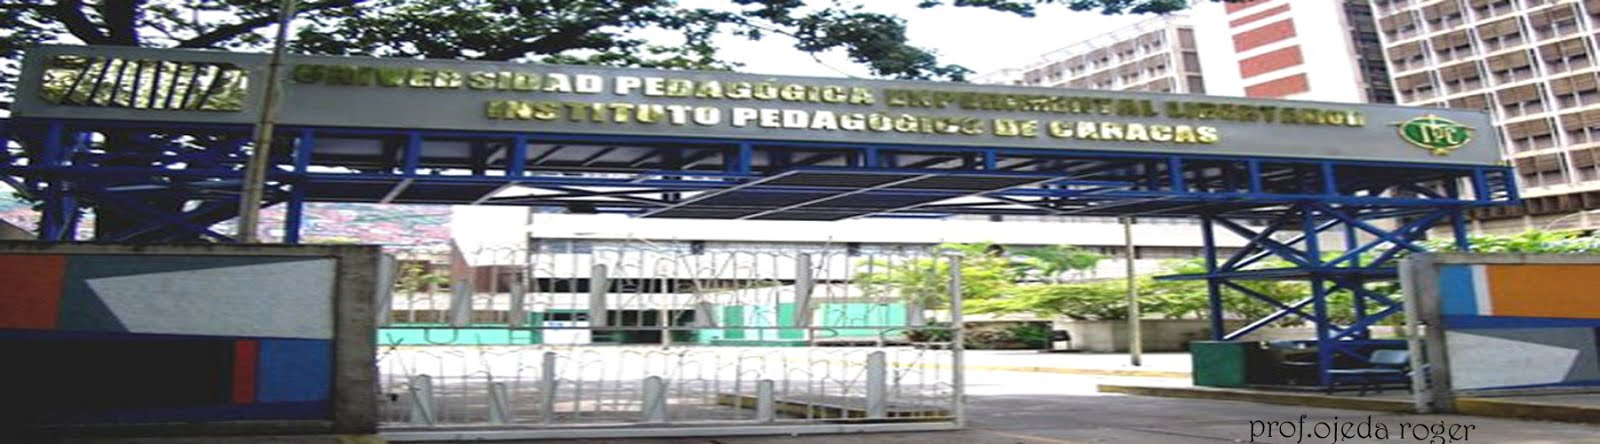 Instituto Pedagógico de Caracas